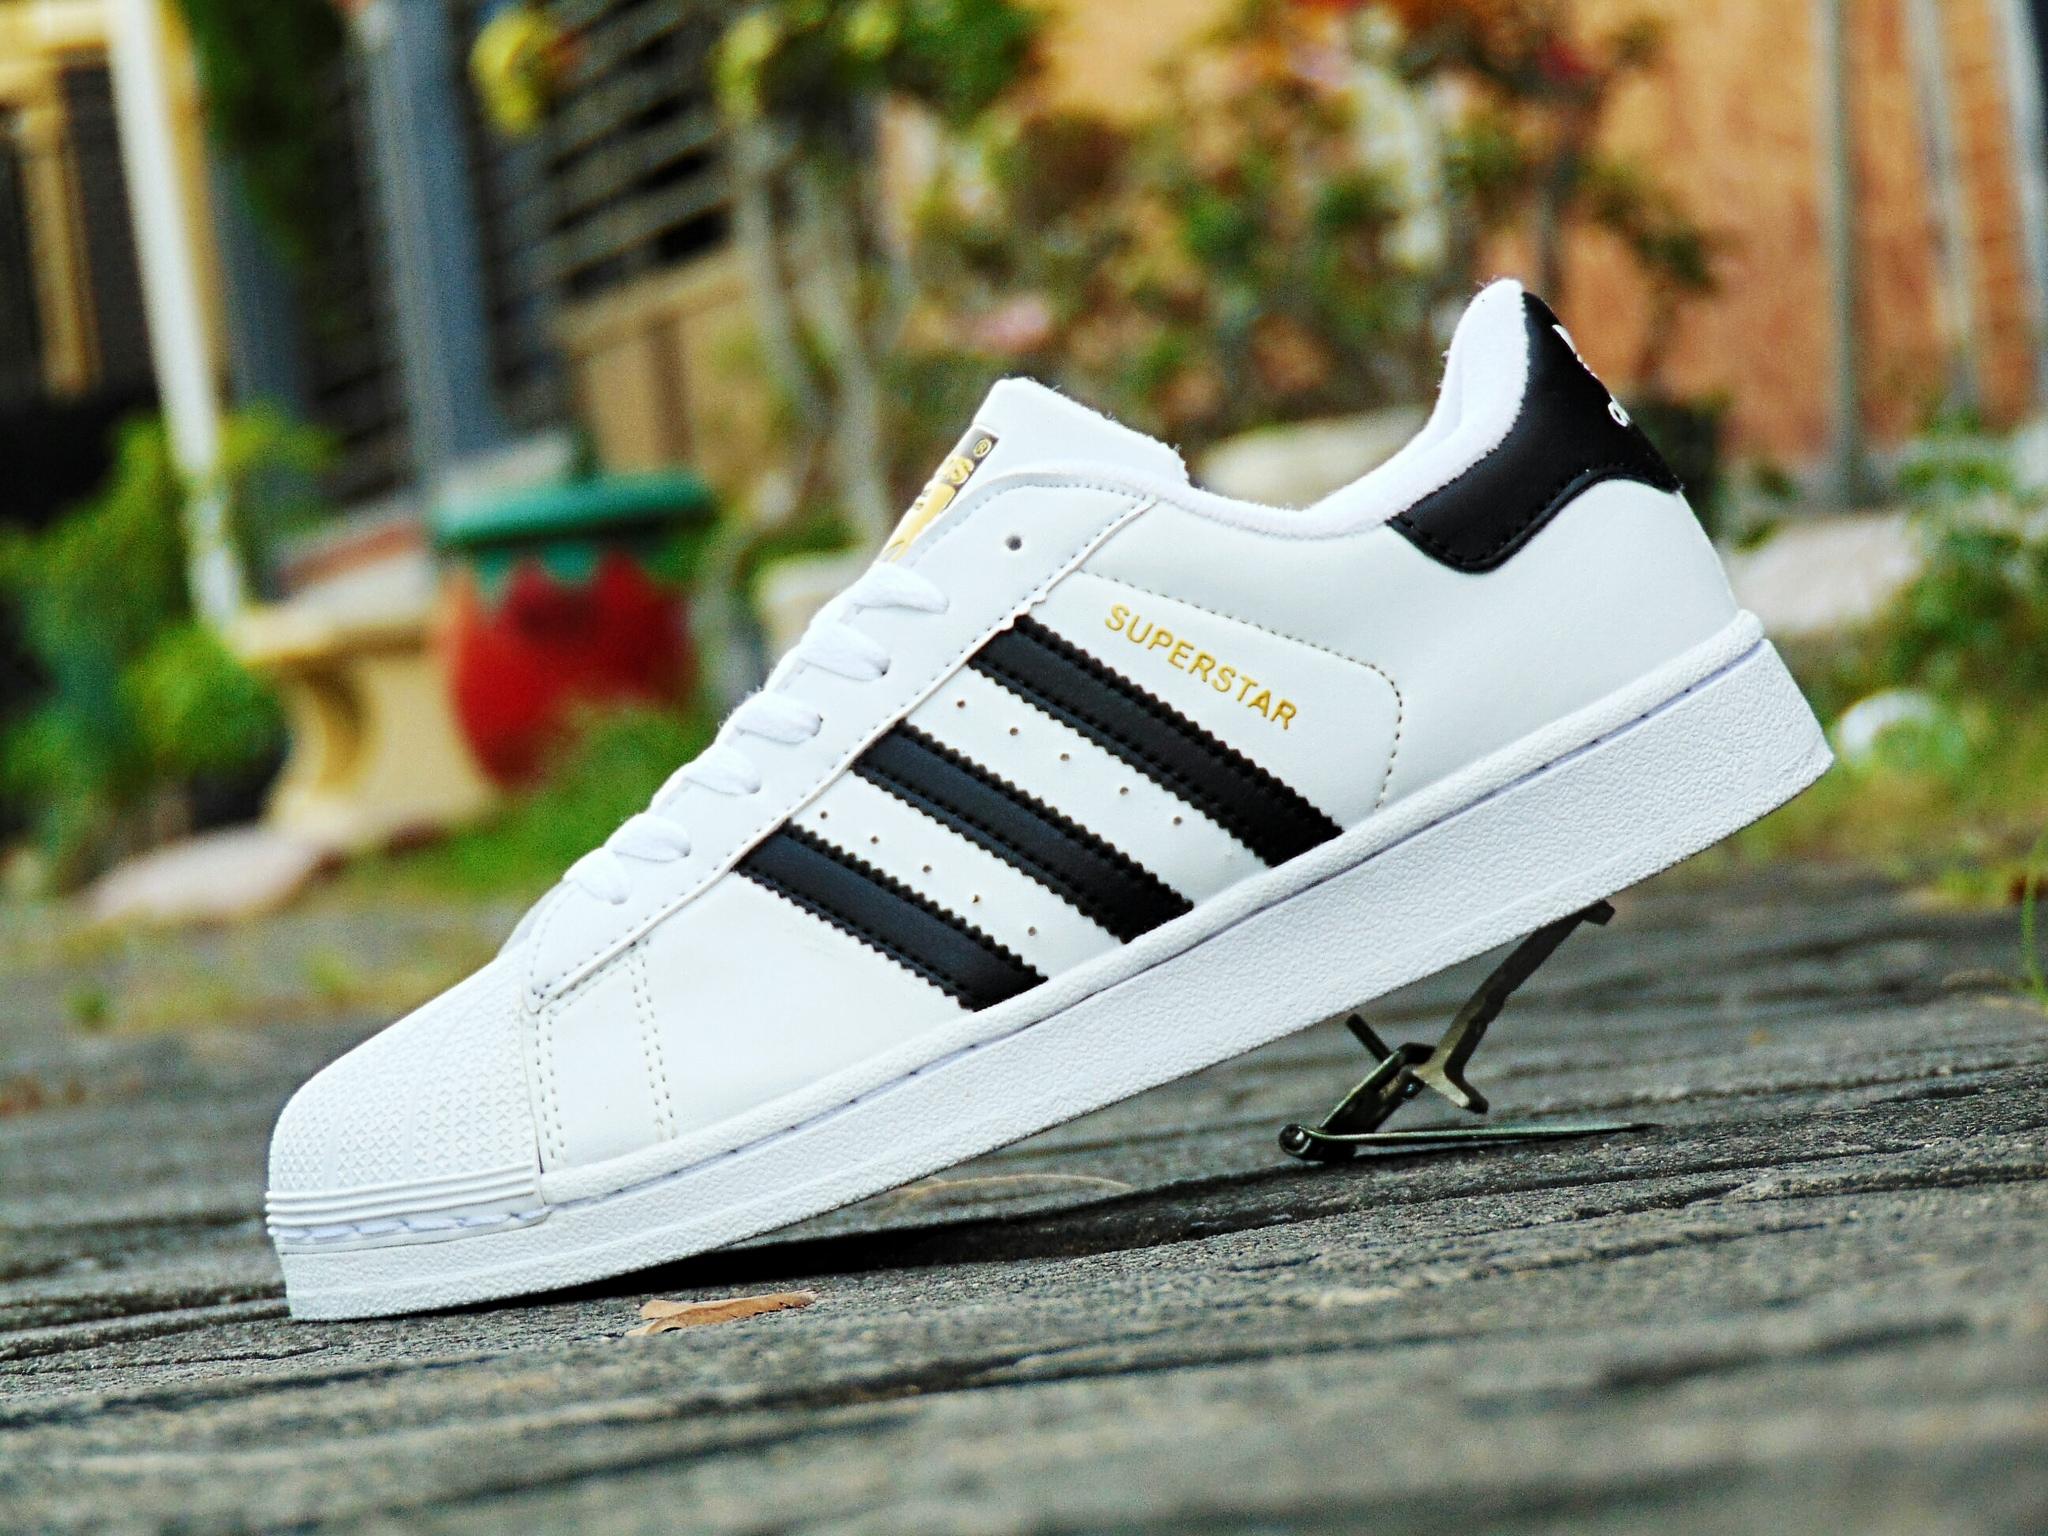 Jual Sepatu Adidas SUPERSTAR SUPERCOLOR Putih List Hitam ... 91cd9a5fdc